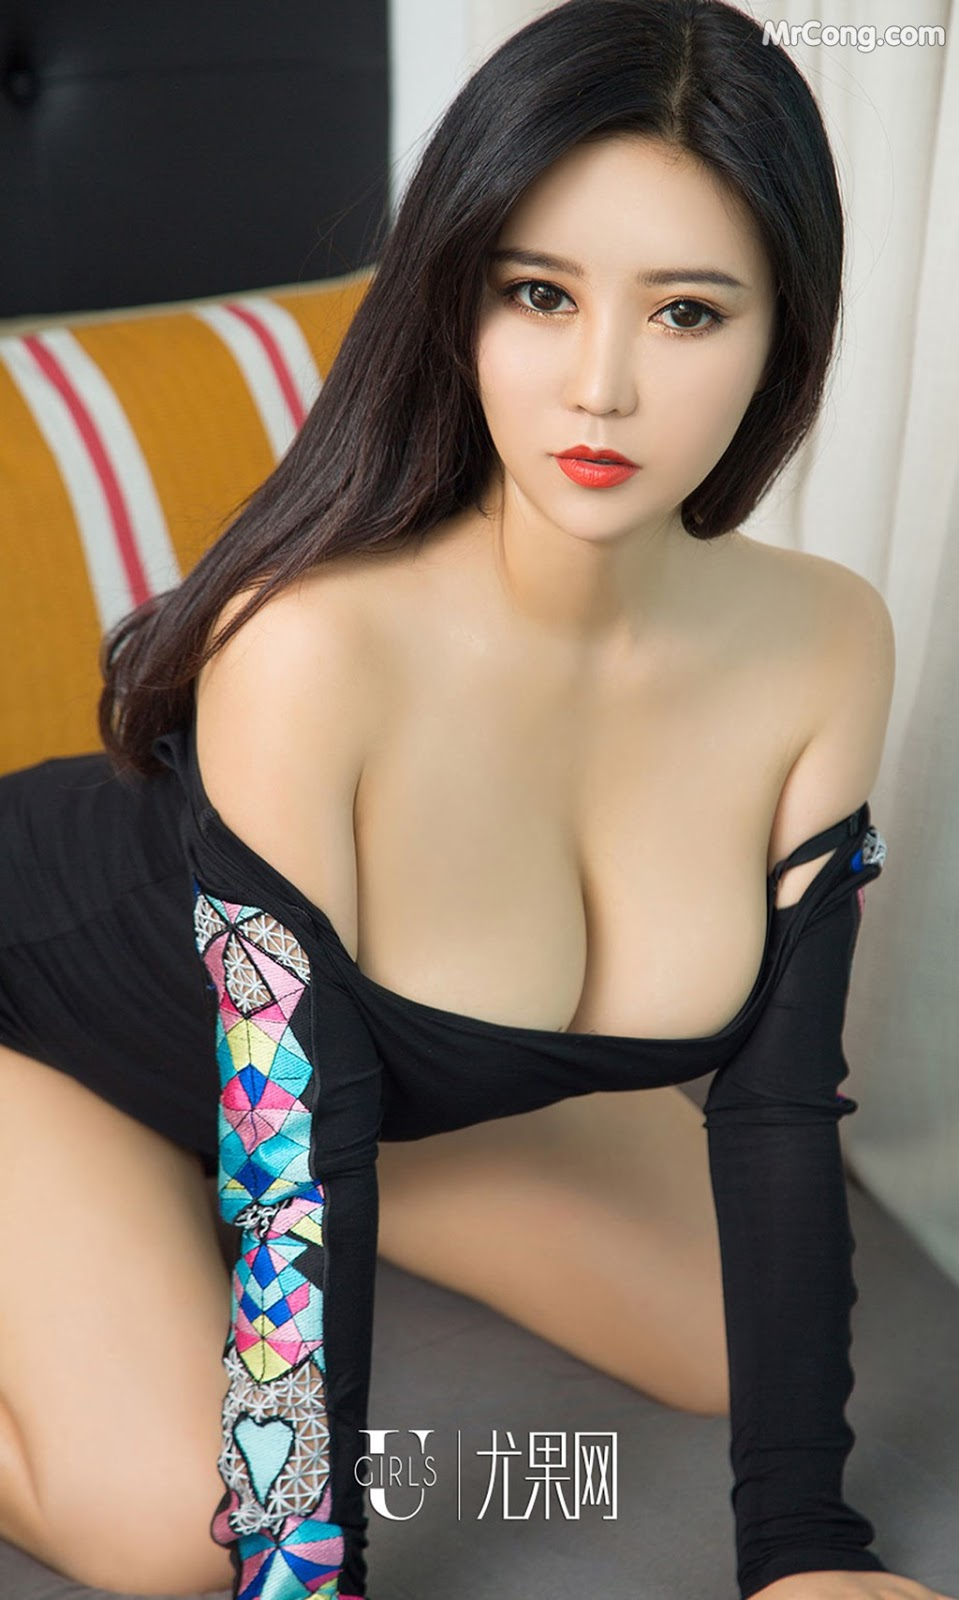 Image UGIRLS-Ai-You-Wu-App-No.1129-Ai-Na-MrCong.com-010 in post UGIRLS – Ai You Wu App No.1129: Người mẫu Ai Na (艾娜) (35 ảnh)